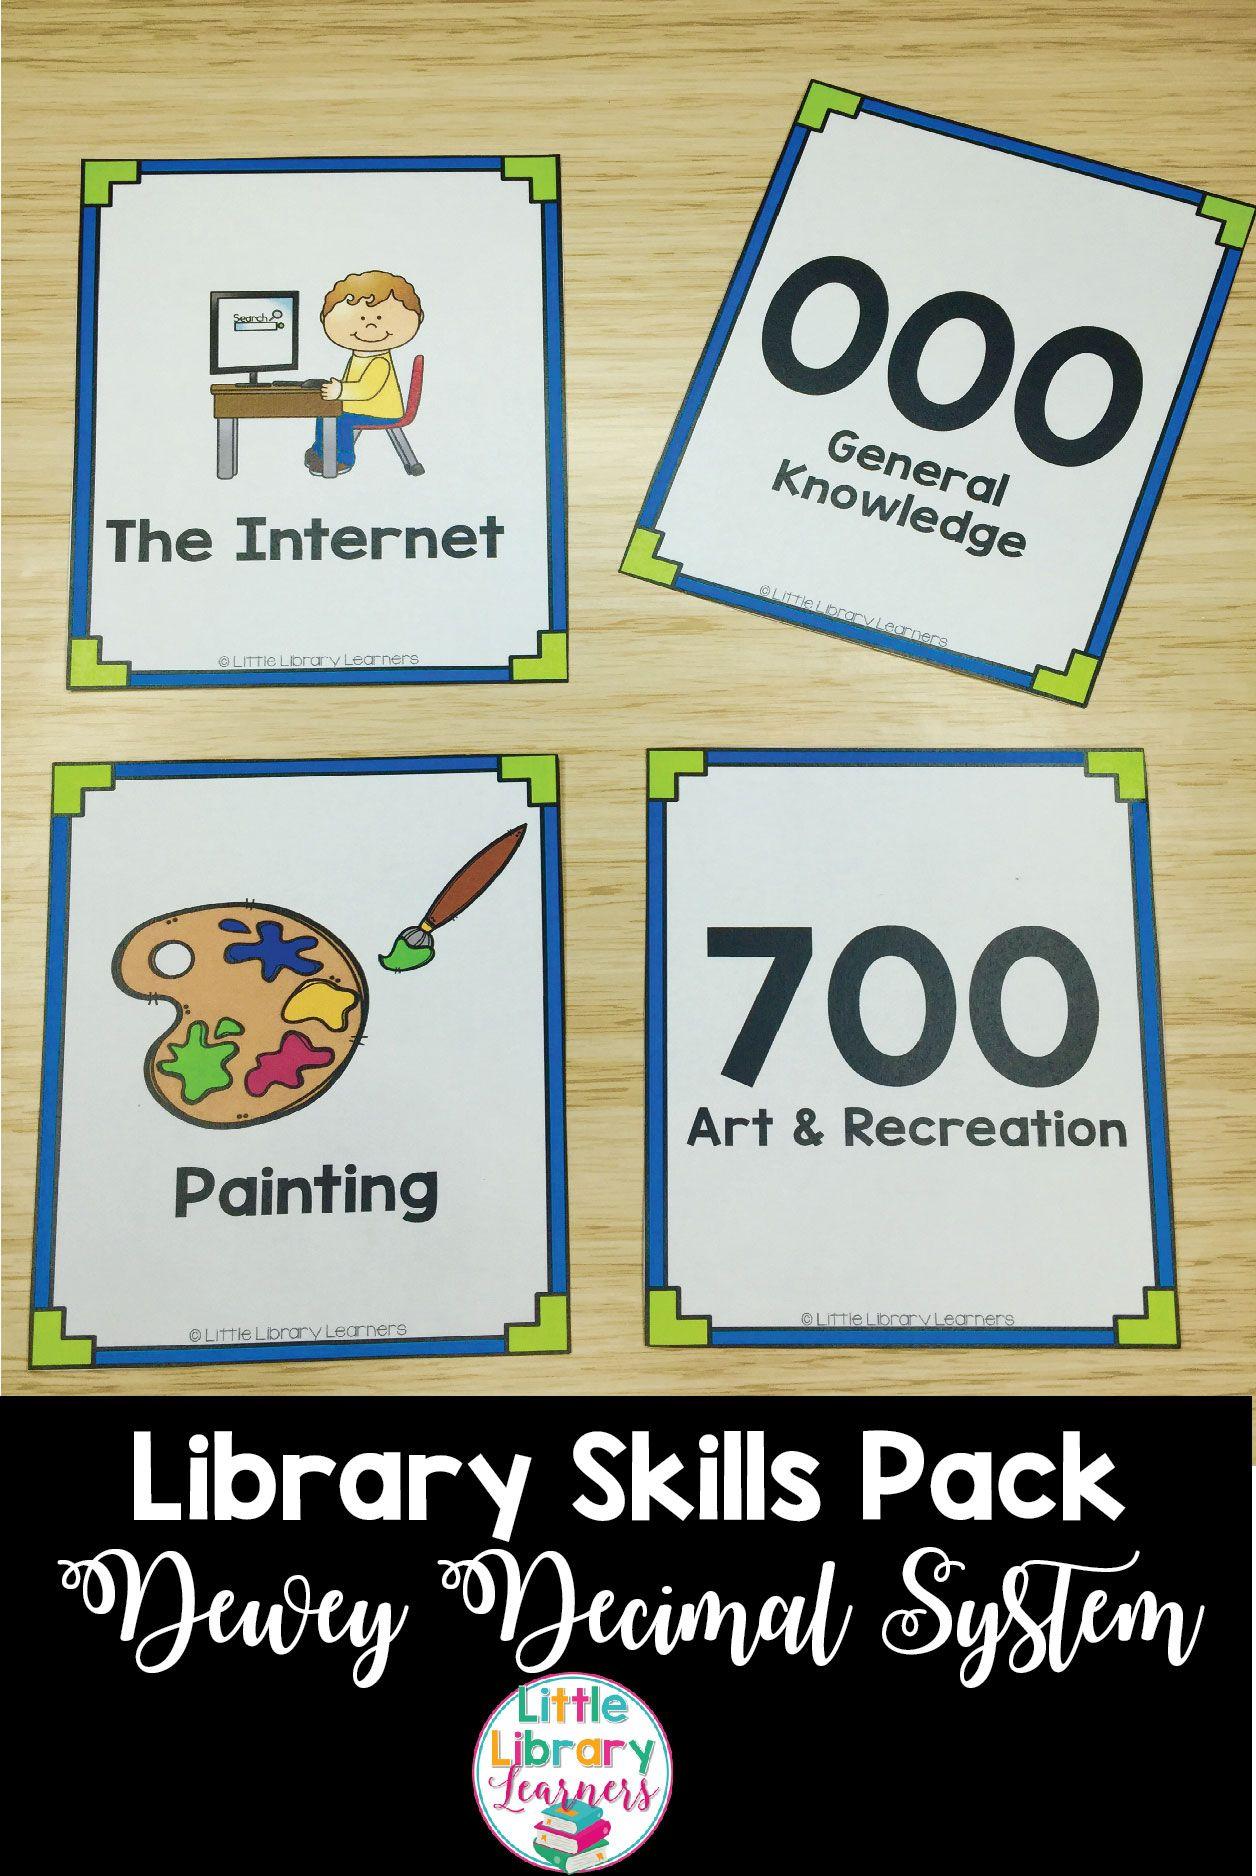 Library Skills Dewey Decimal System Pack